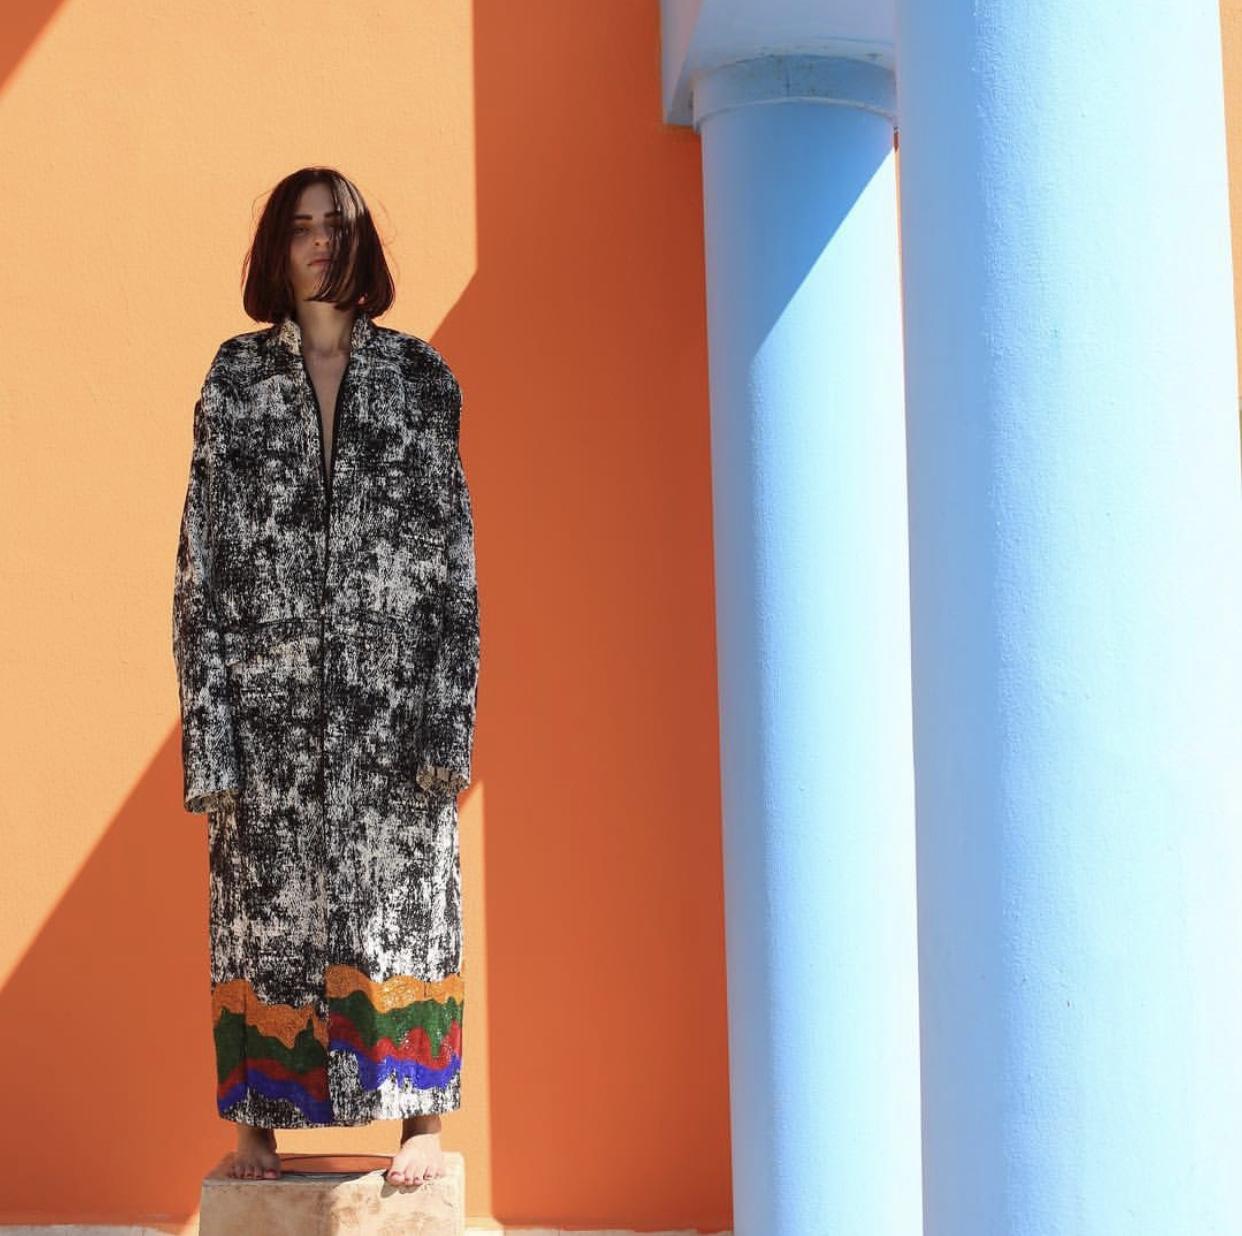 Photo: Courtesy of Farah Mady   Model: Nour Mady   Styling: Farah Mady   Photography: Laura Karam